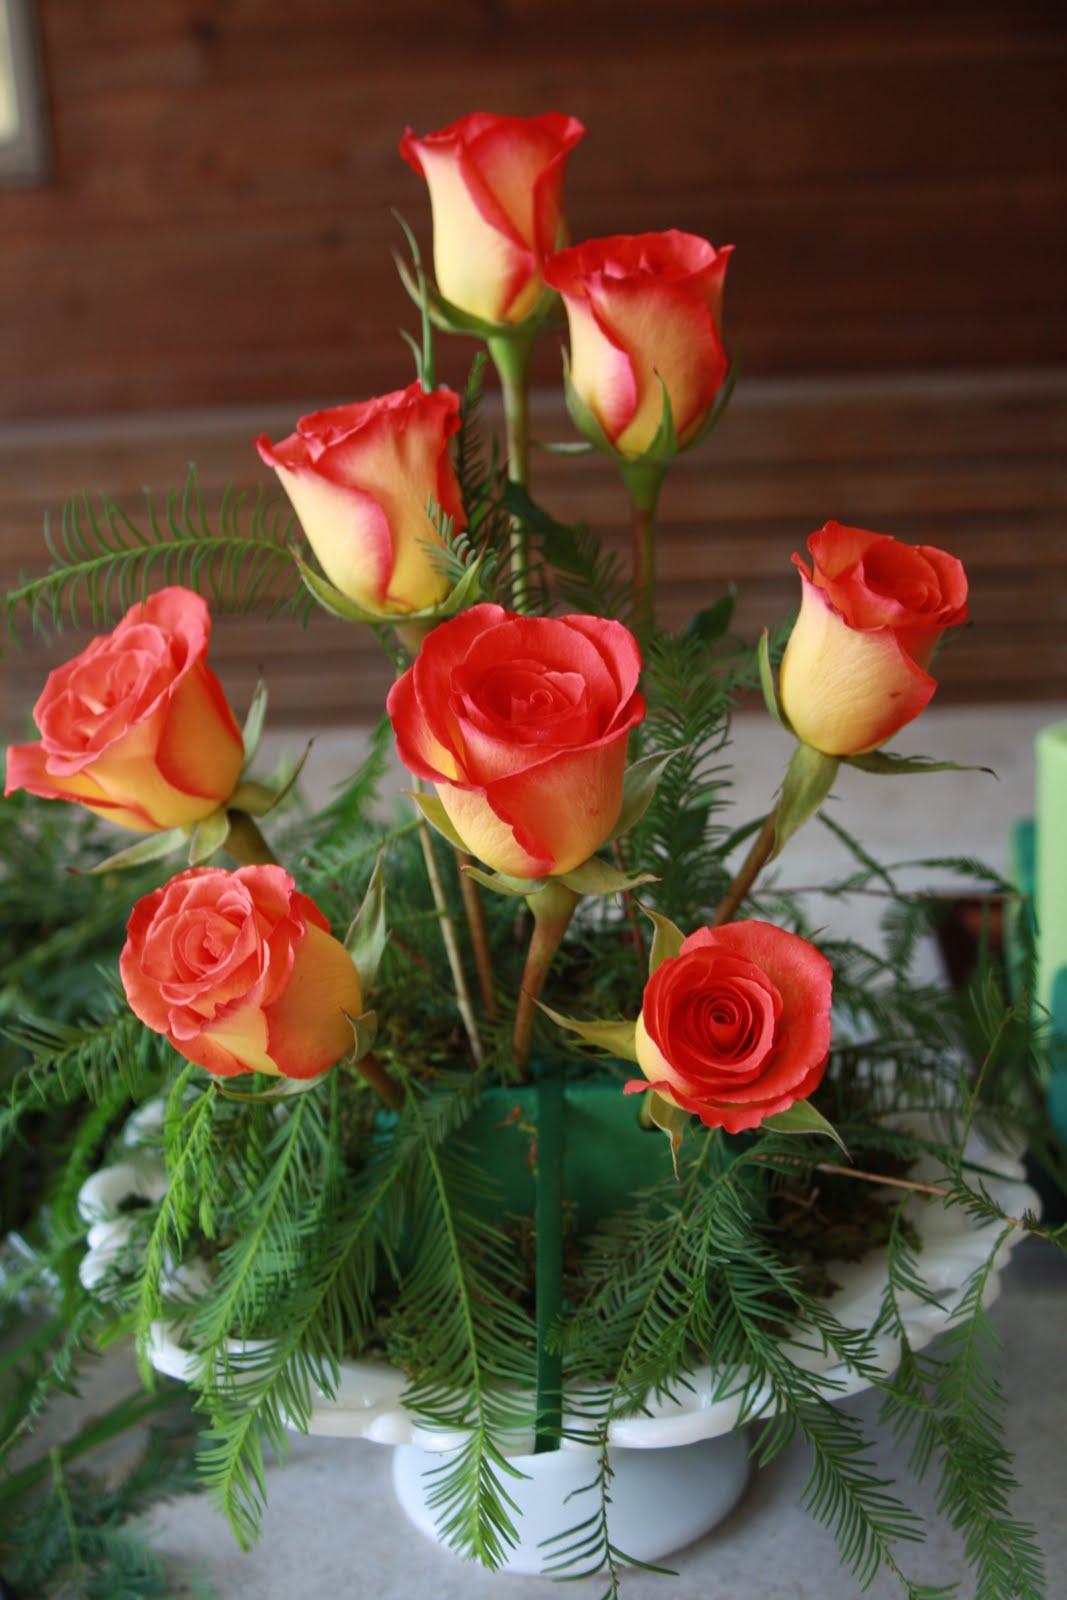 Hopeful How to Make Flower Arrangements